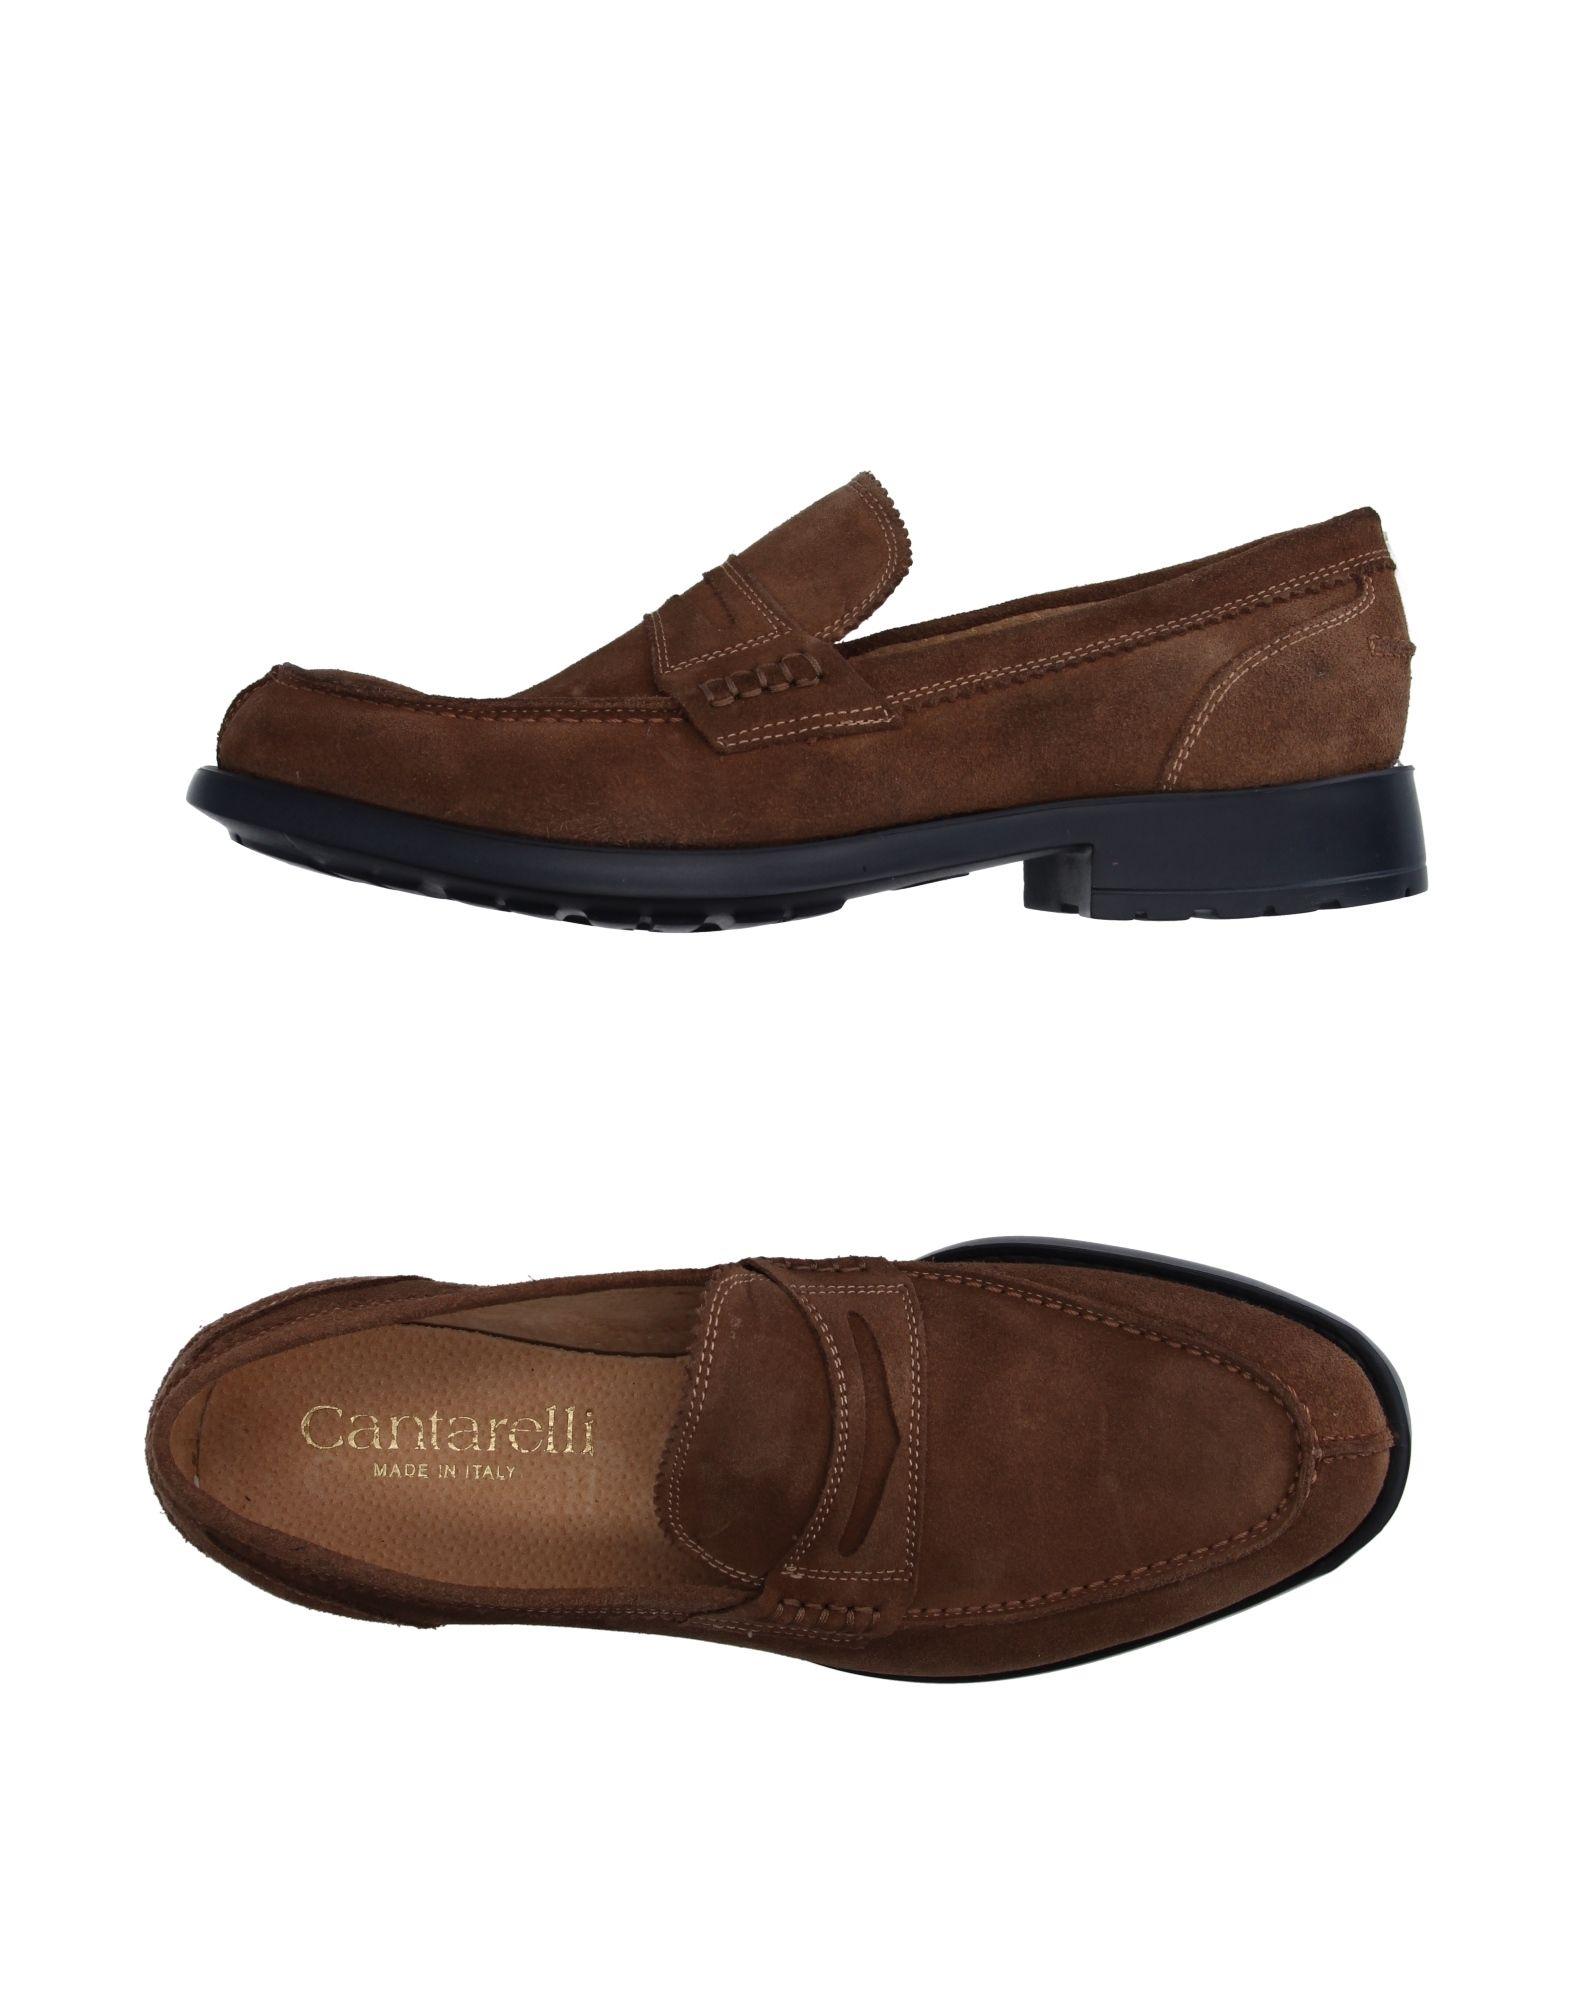 Cantarelli Mokassins Herren  11108993JS Heiße Schuhe